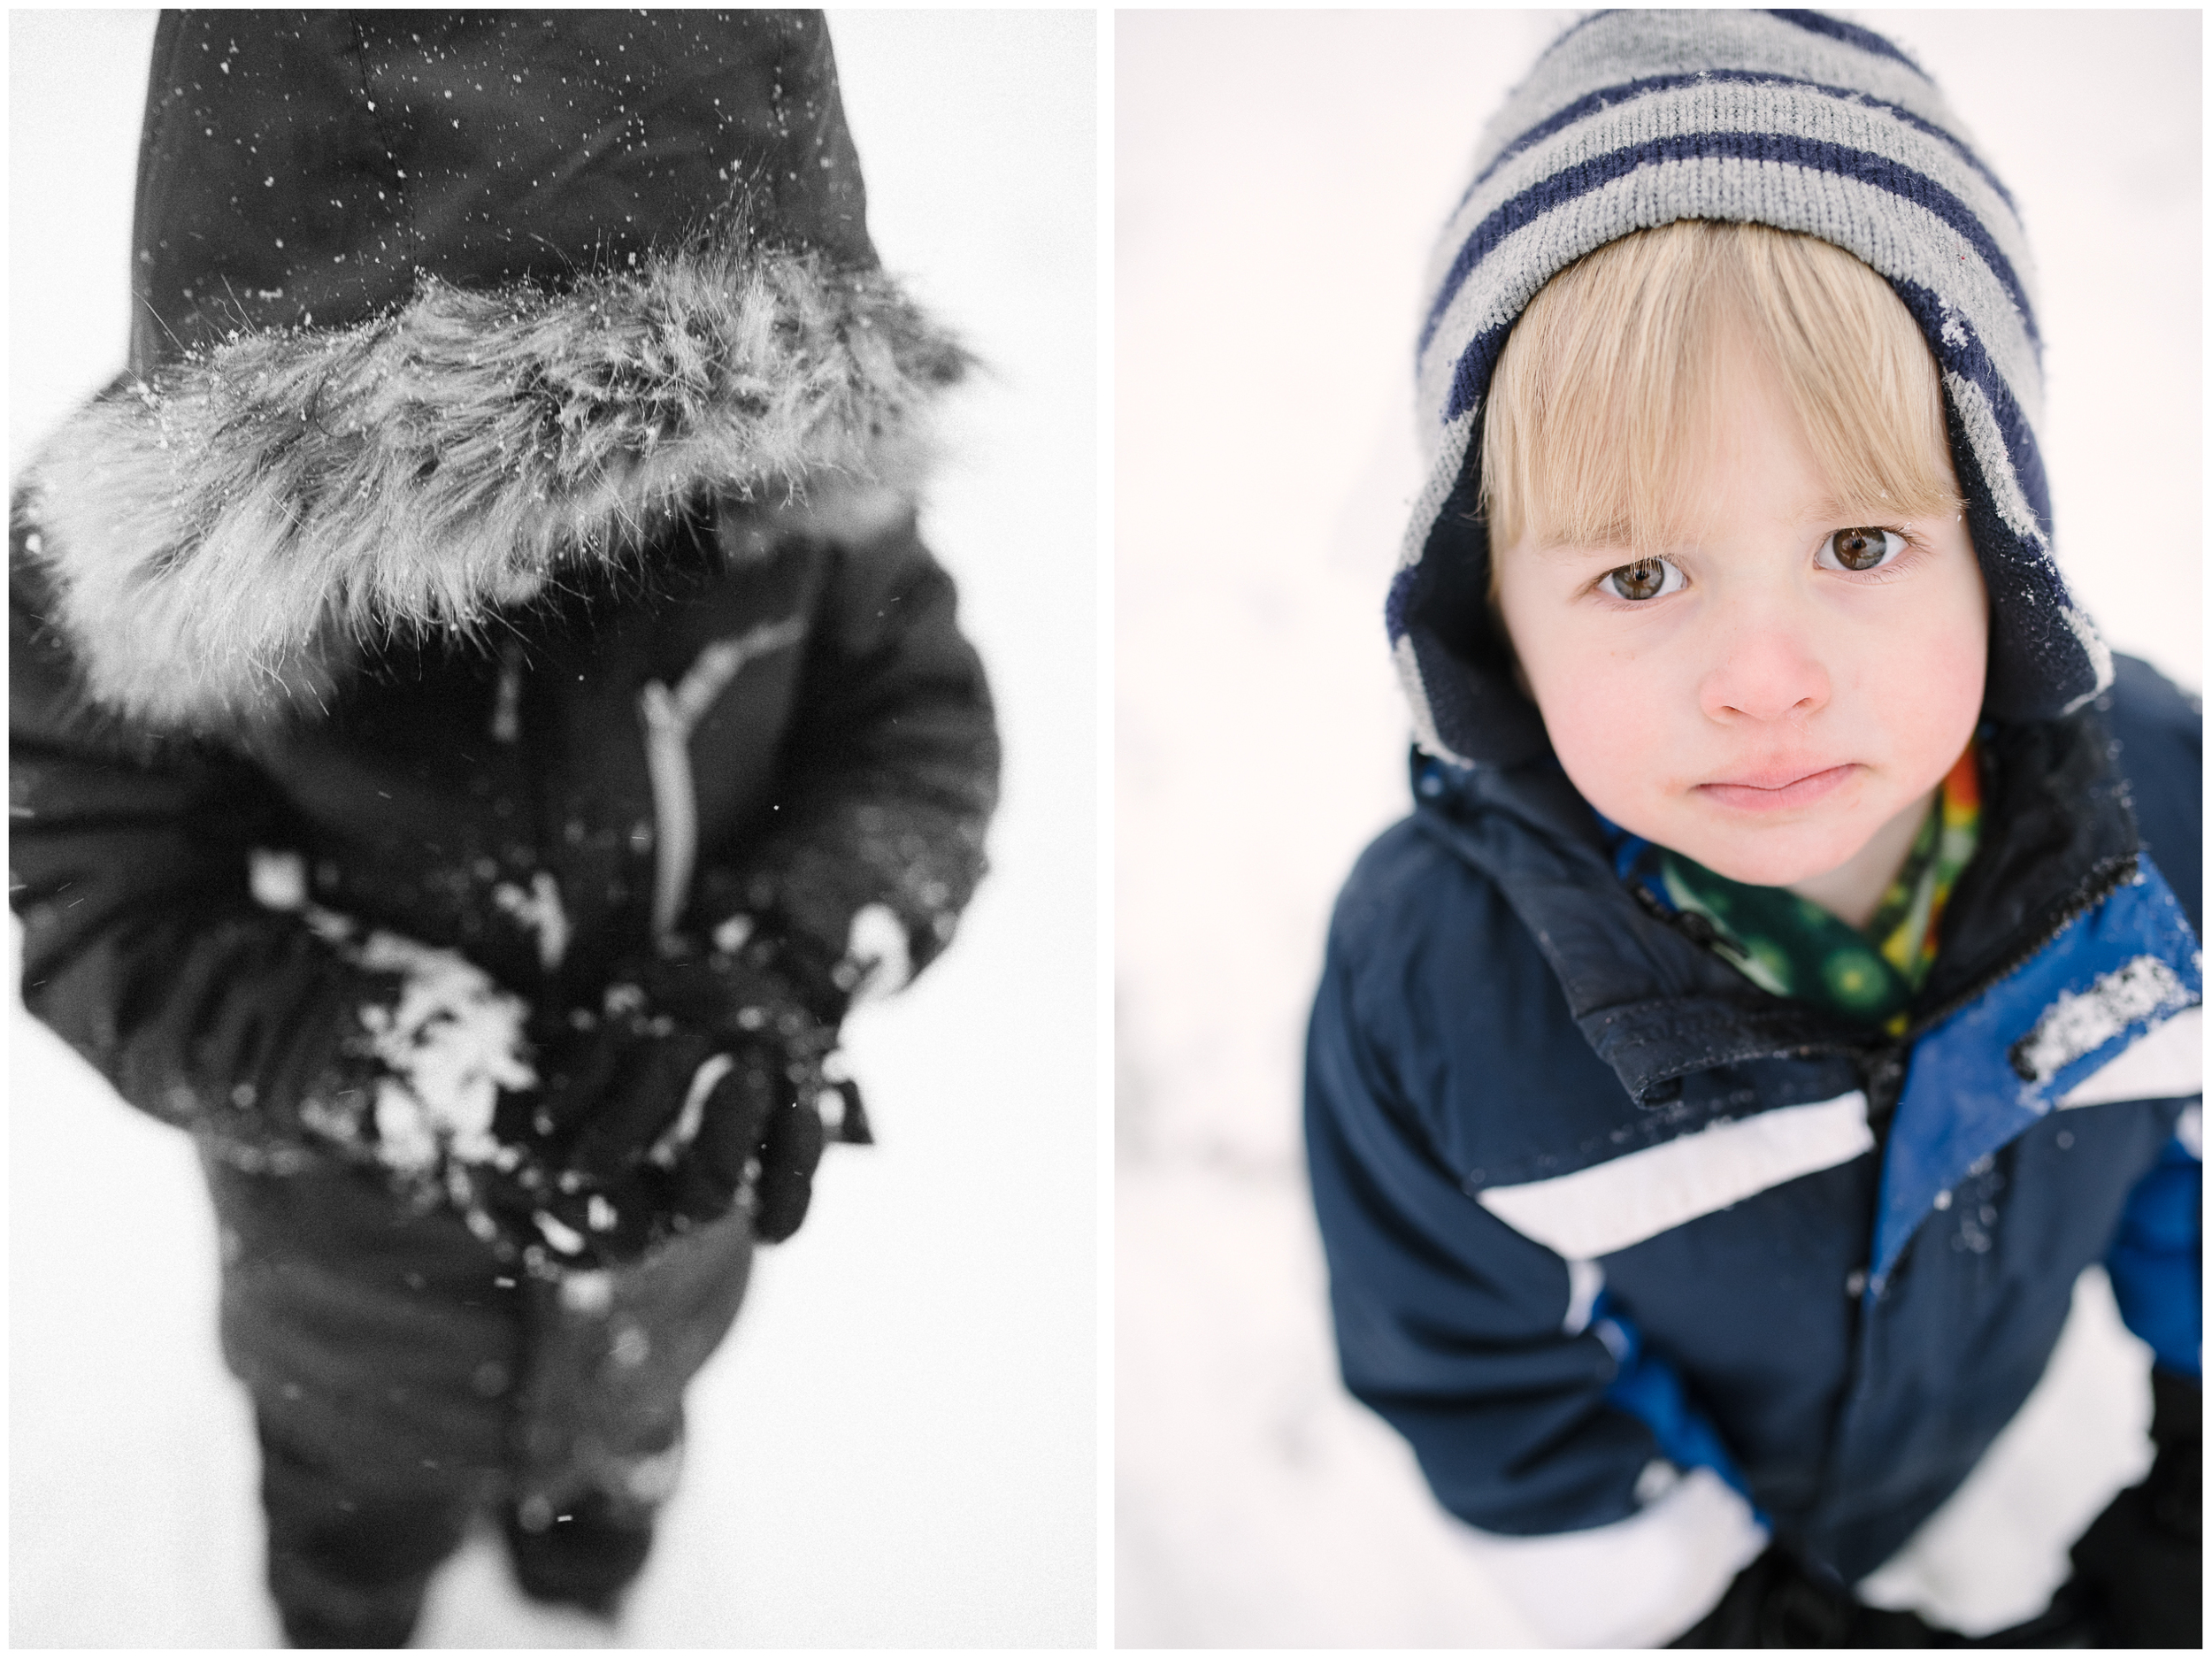 pittsburgh photographer snow portrait mariah fisher.jpg